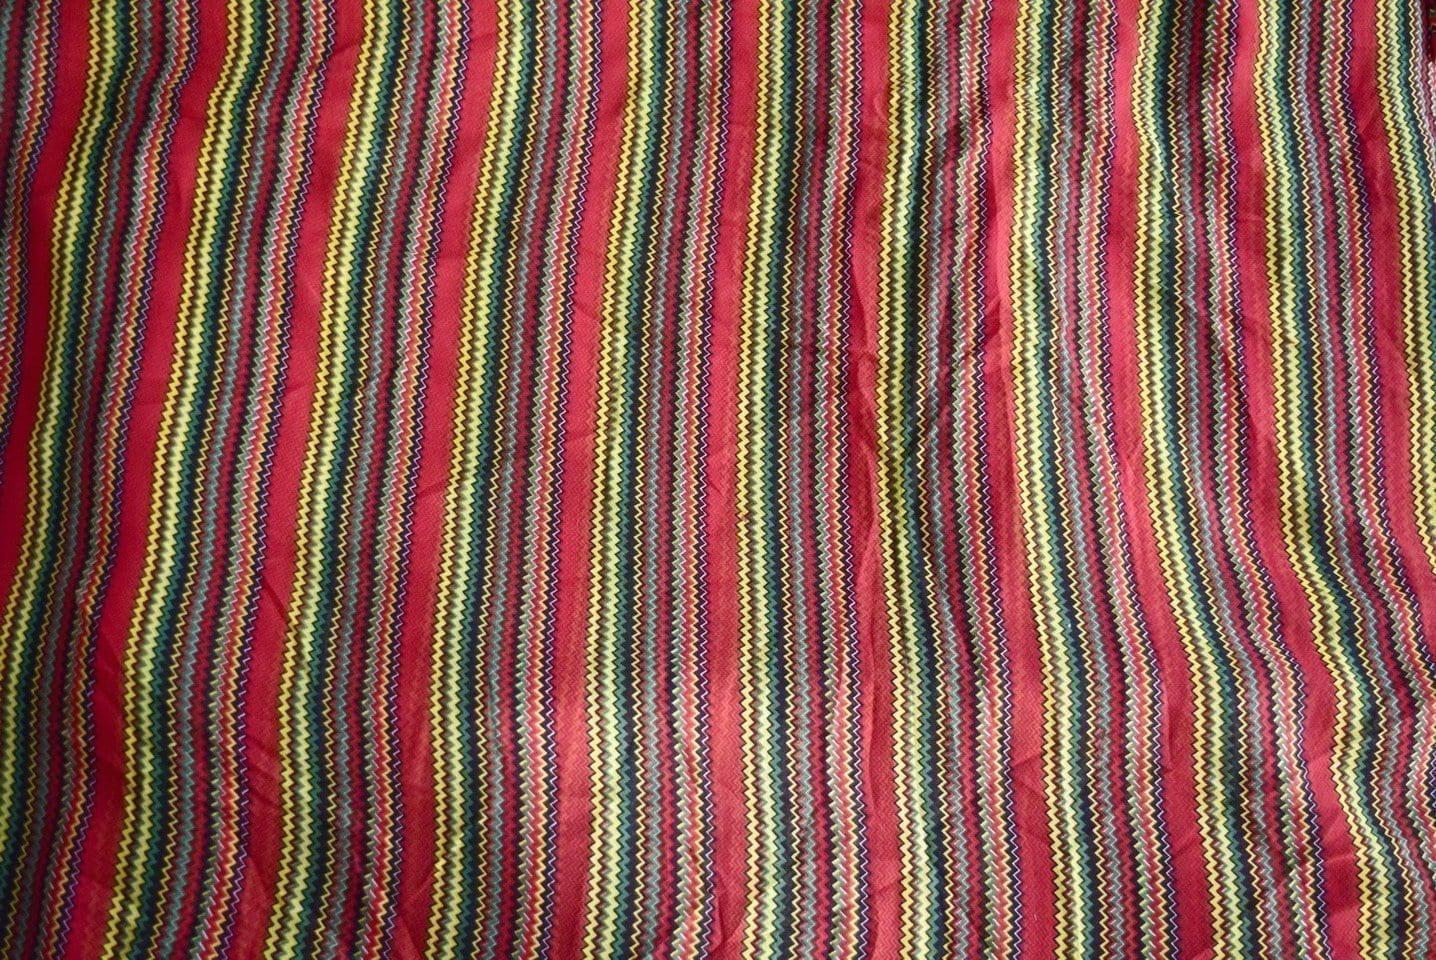 GEORGETTE PRINTED fabric for Kurti, Saree, Salwar, Dupatta GF029 2